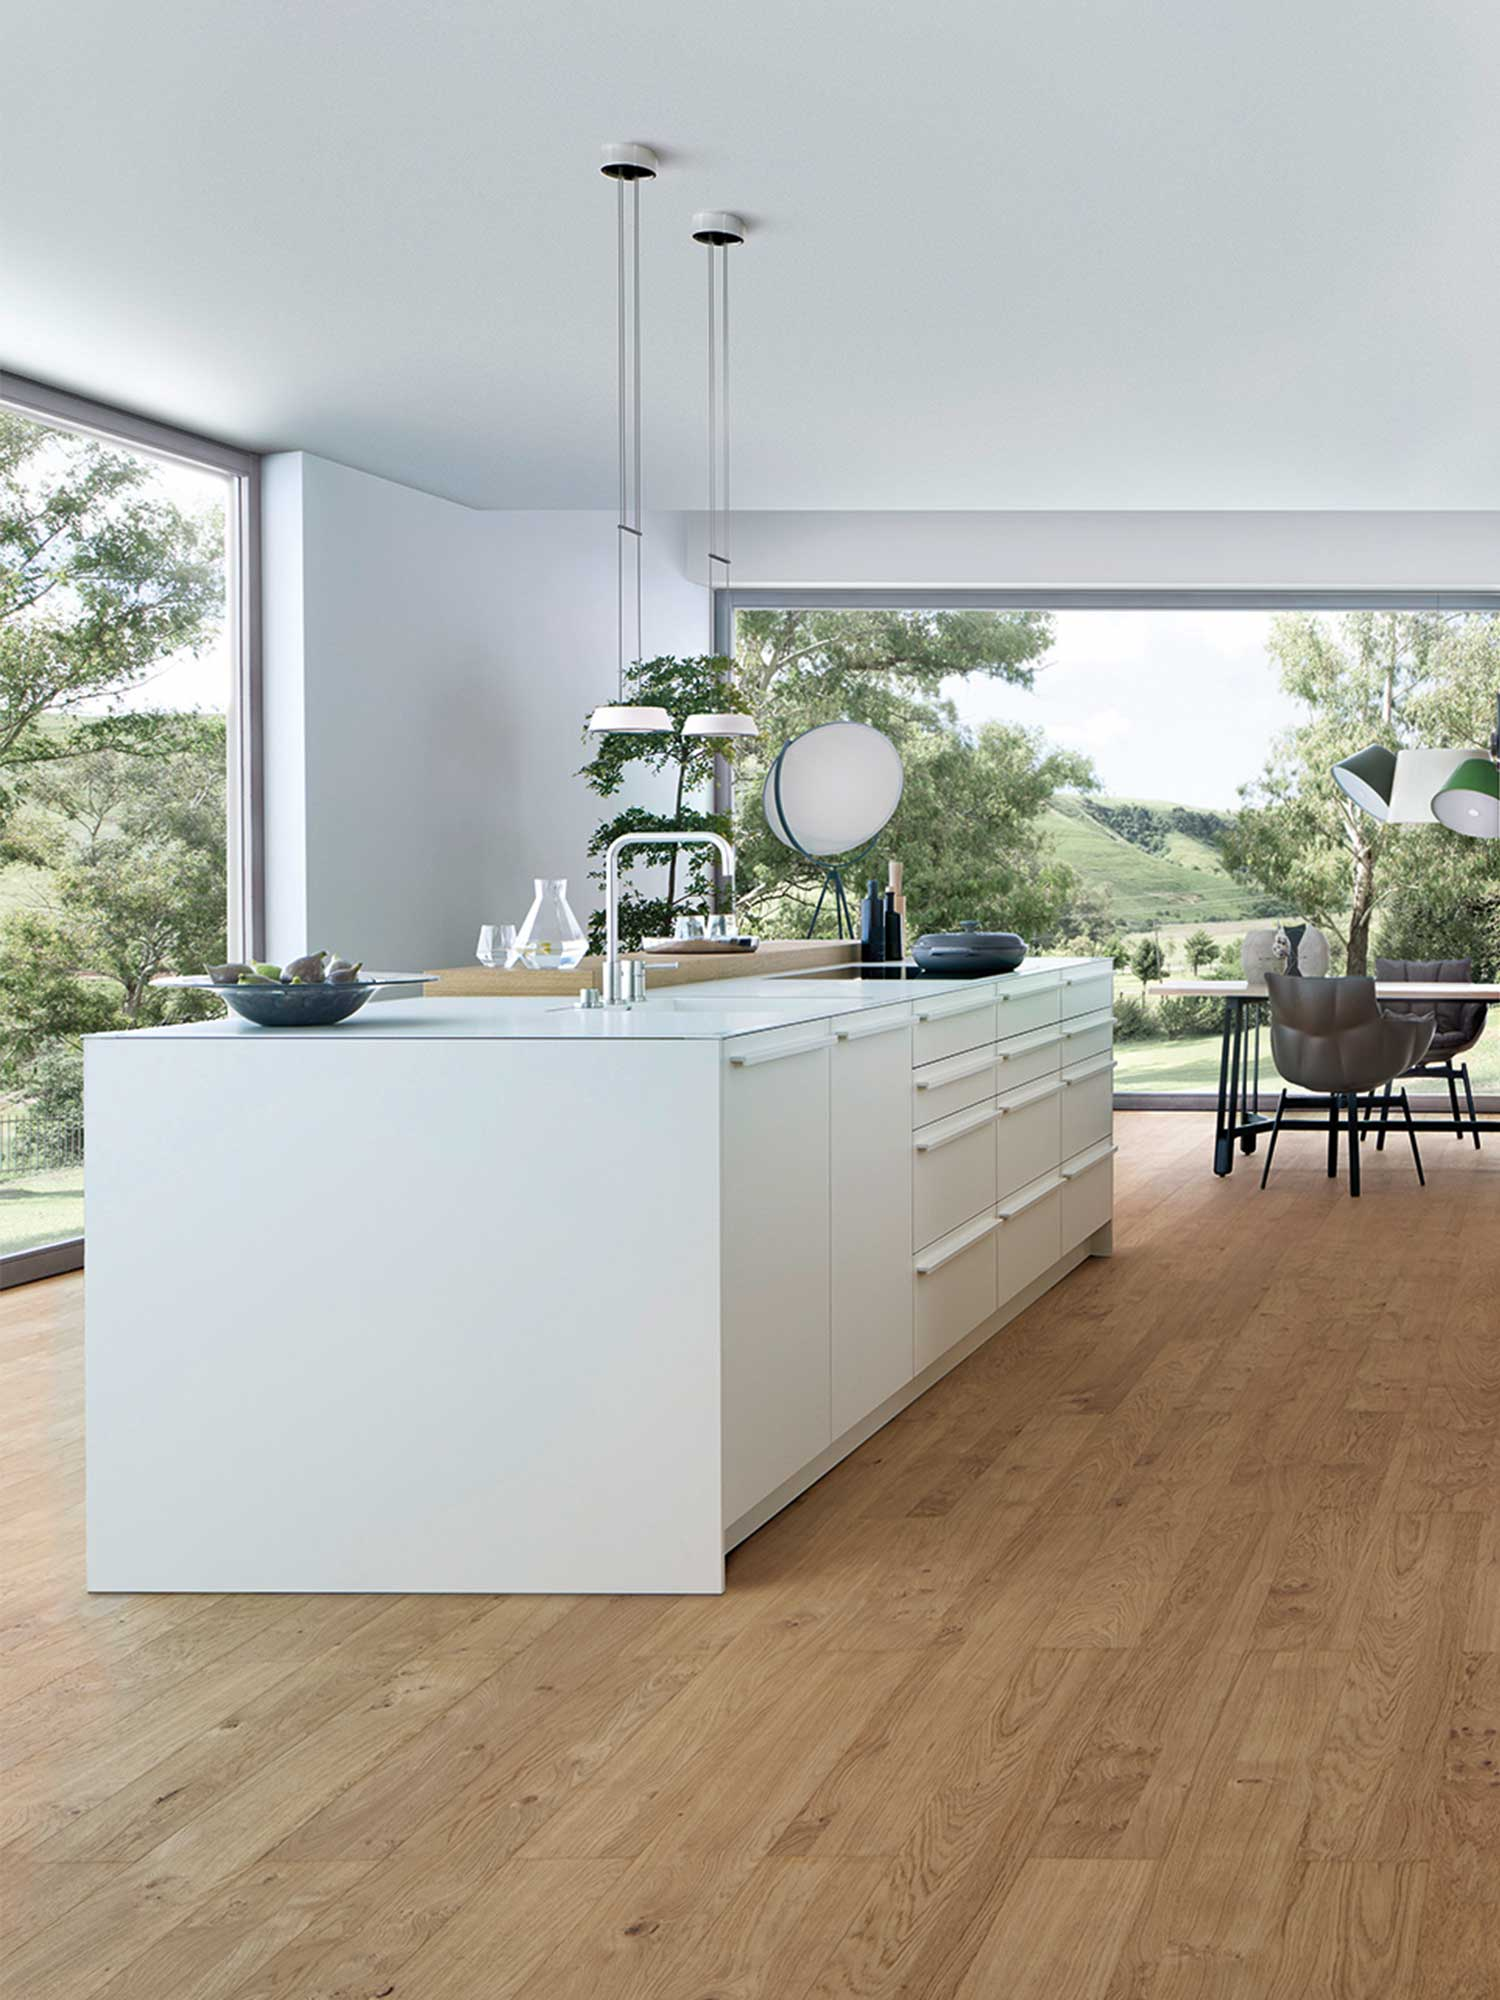 White minimalist kitchen by Hubble